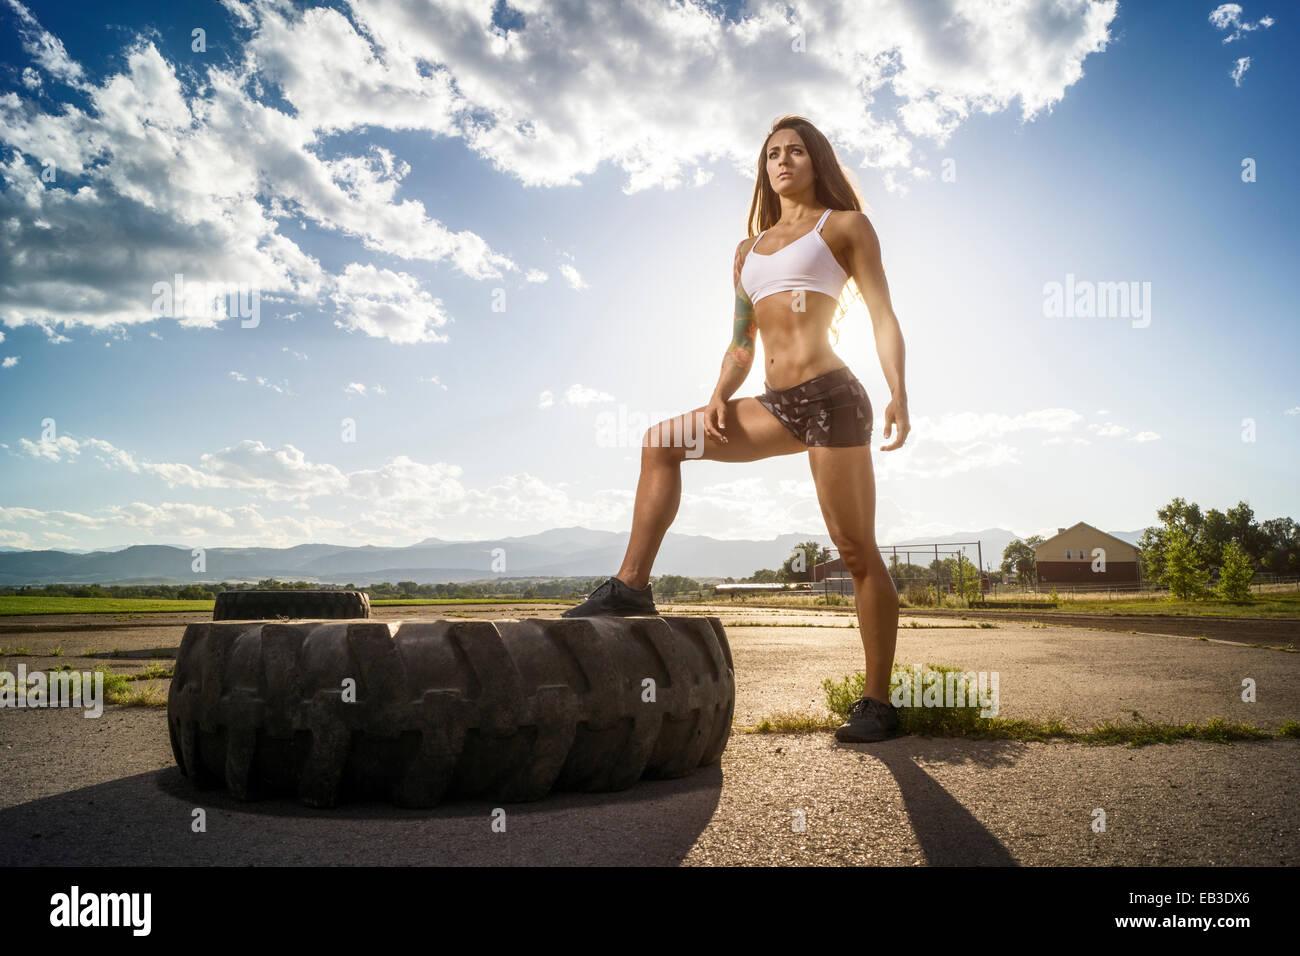 Müde, Arvada, posiert mit Track-Sportlerin, Jefferson County, Colorado, USA Stockbild